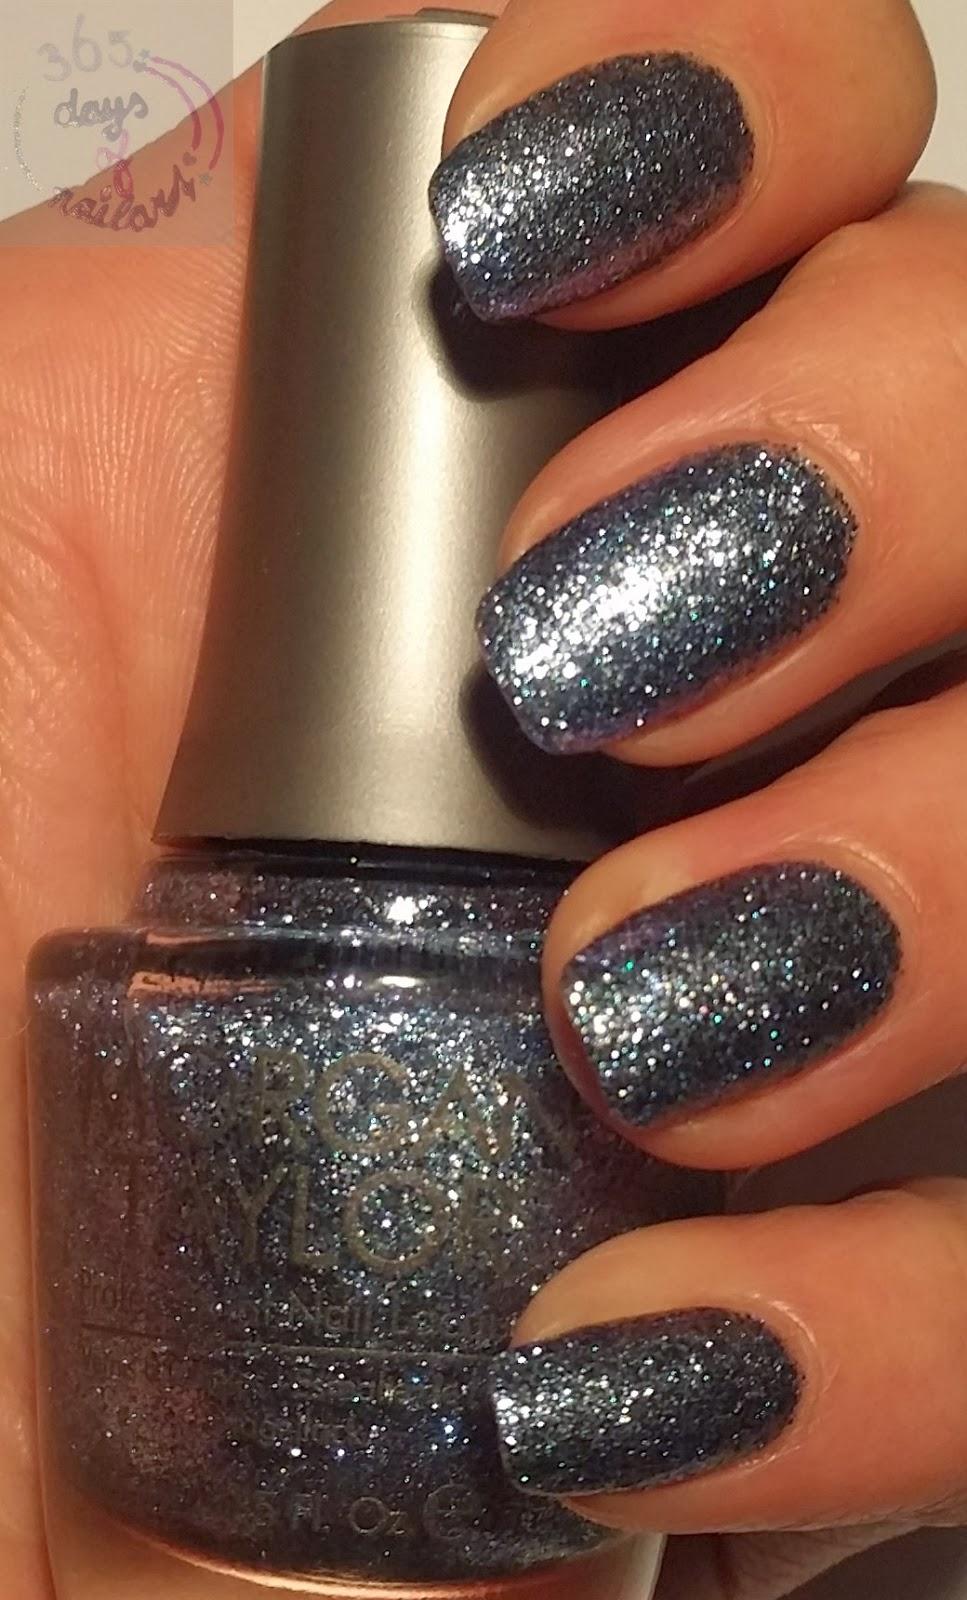 365+ days of nail art: Day 347) Easy Christmas tree nail designs